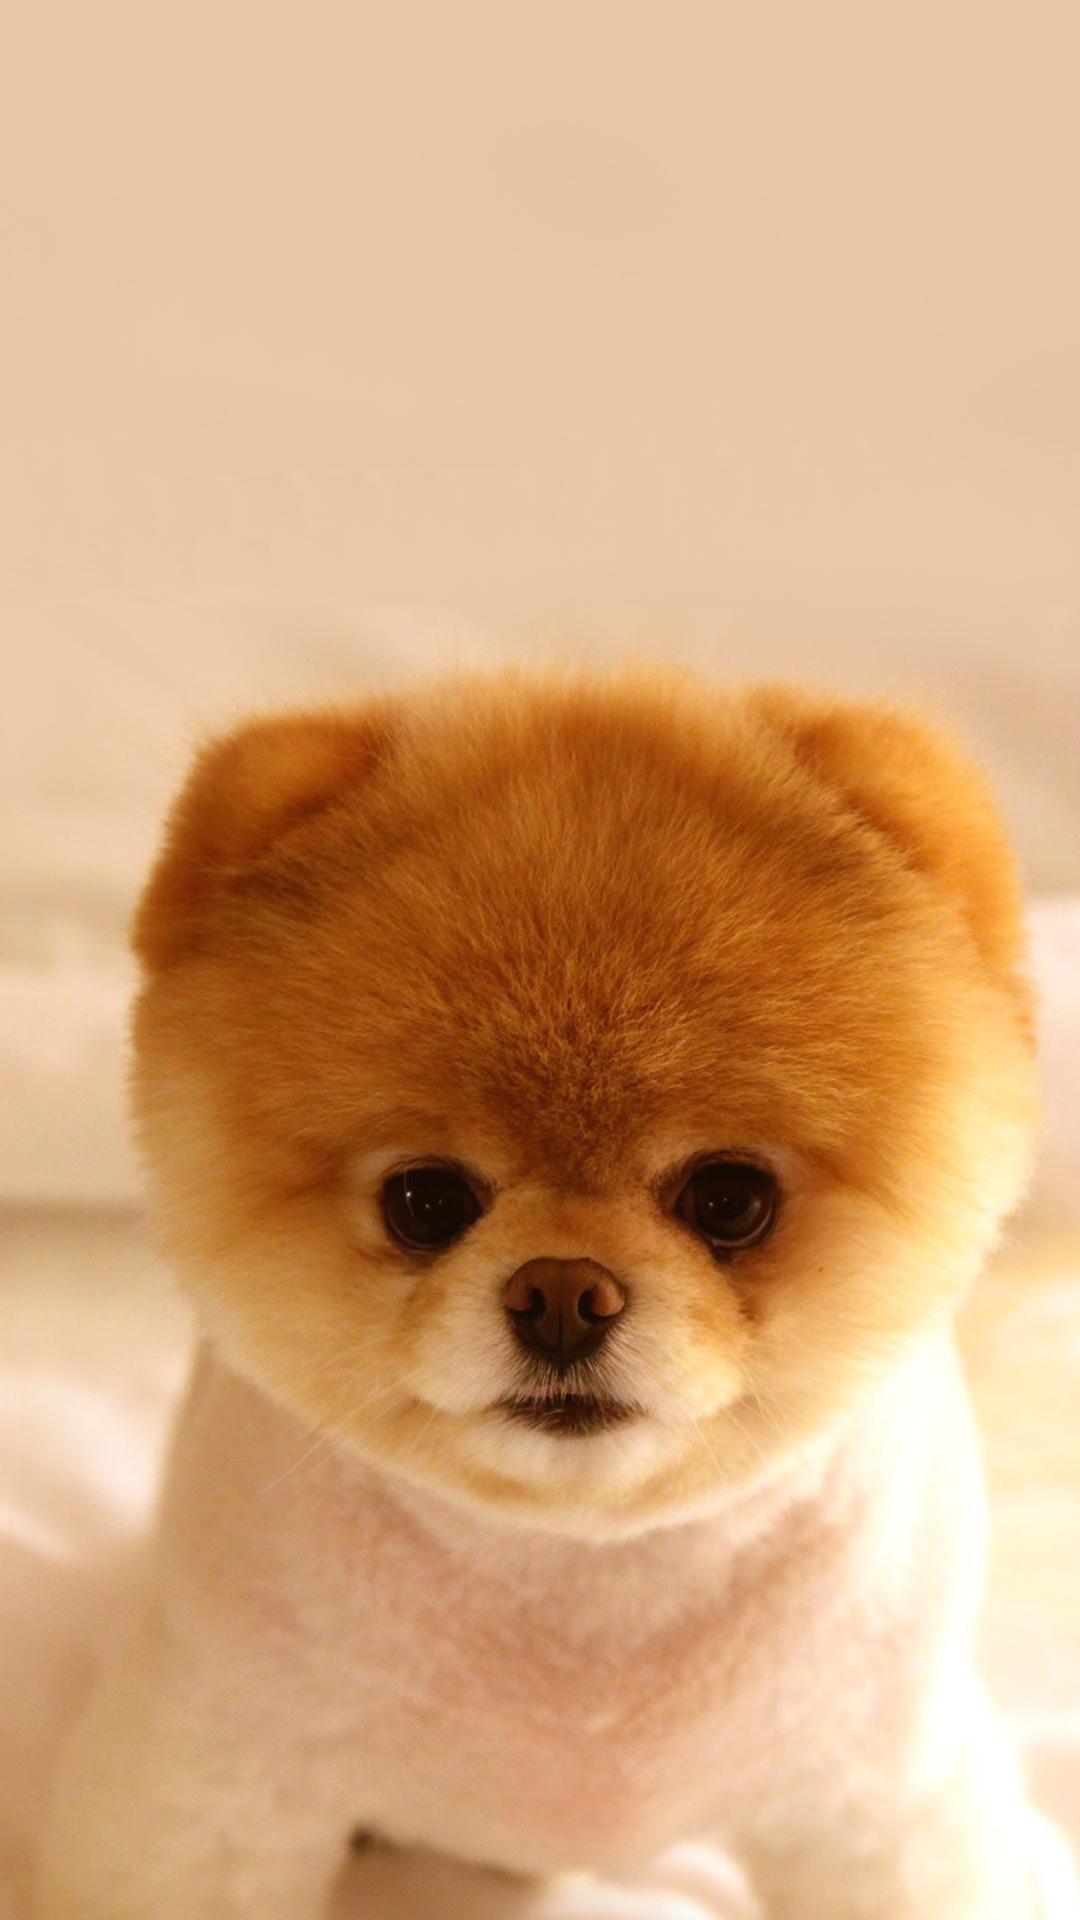 Free Hd Cutest Puppy Dog Phone Wallpaper 4982